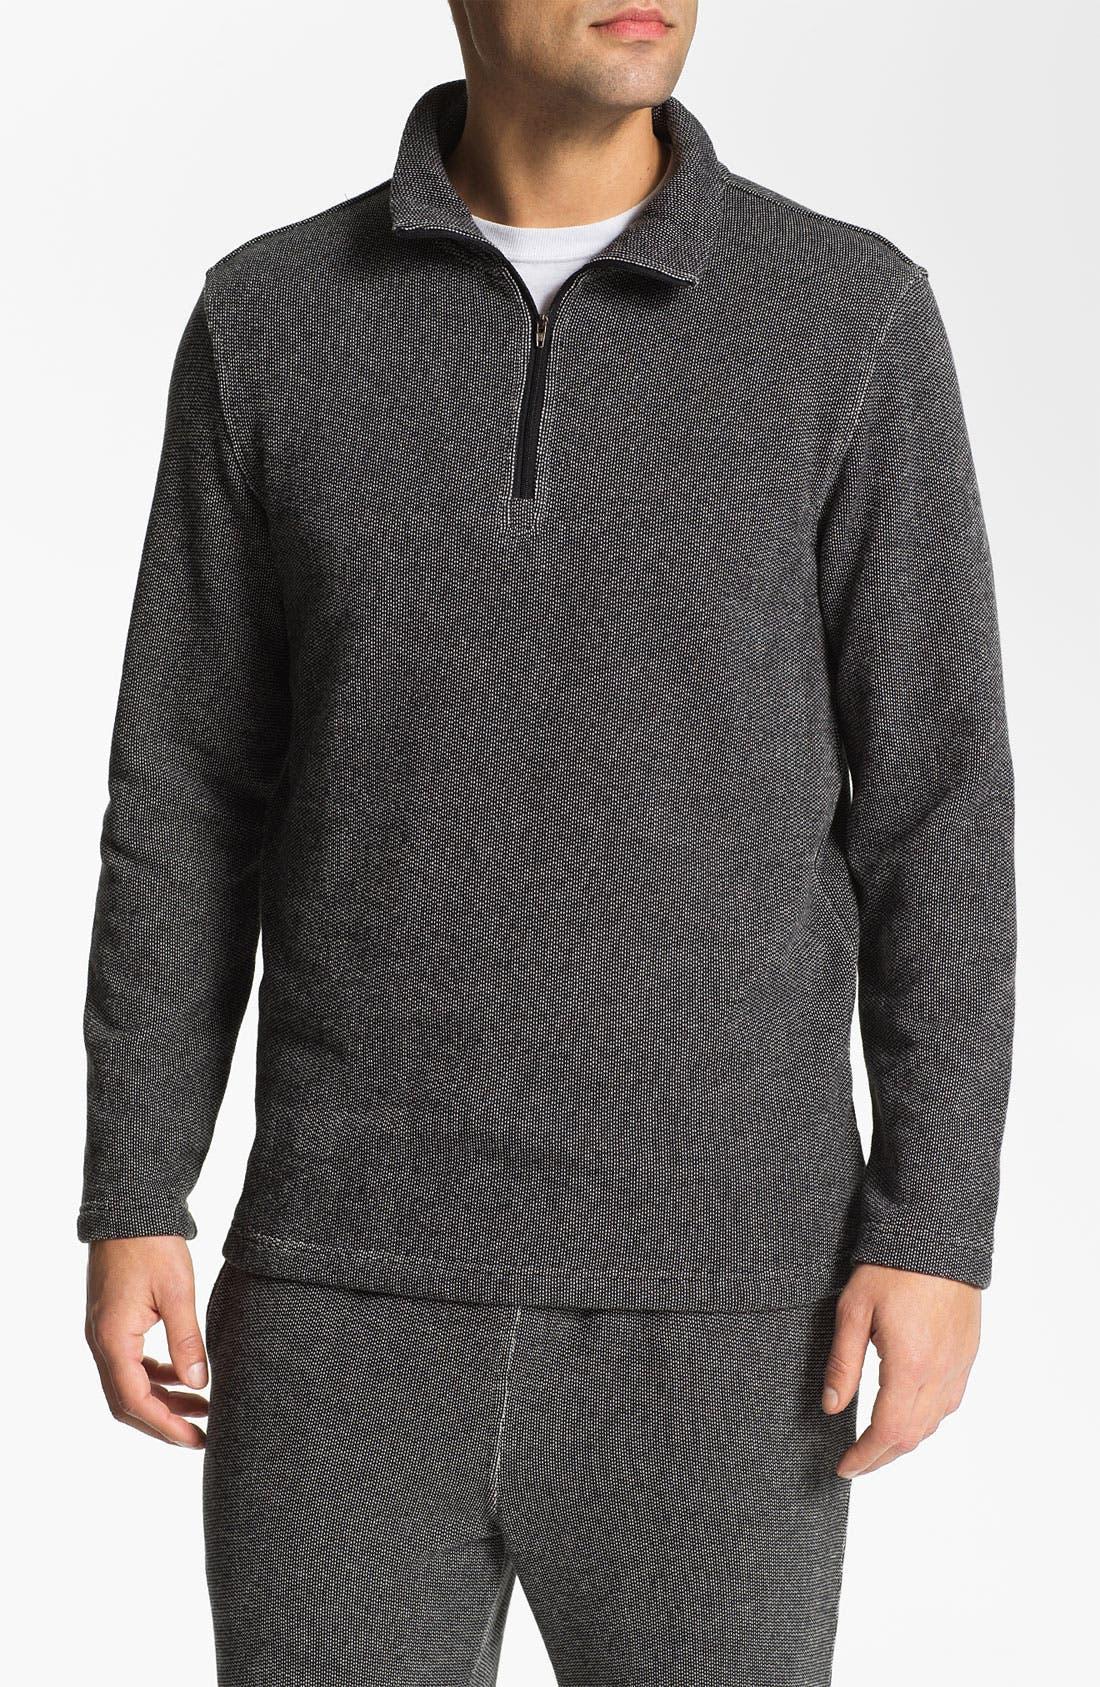 Main Image - Daniel Buchler Quarter Zip Textured Cotton Blend Sweatshirt